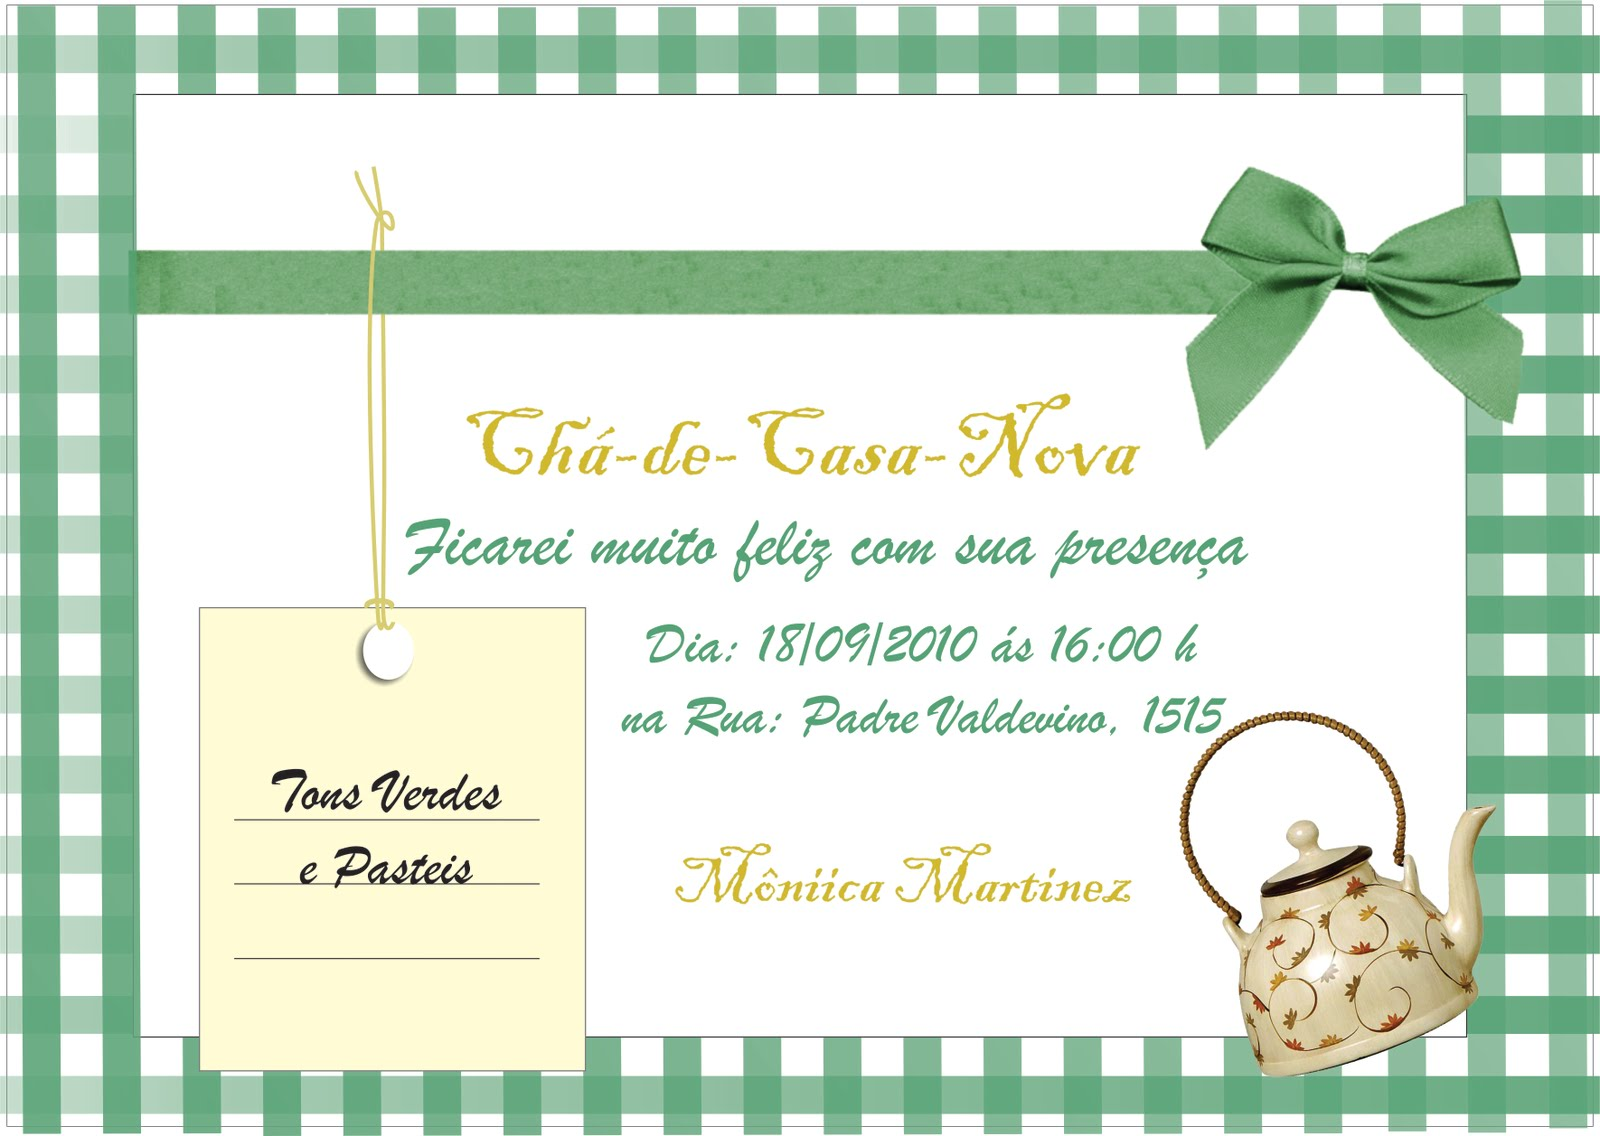 Patrycia Convite Chá De Casa Nova Corel Draw